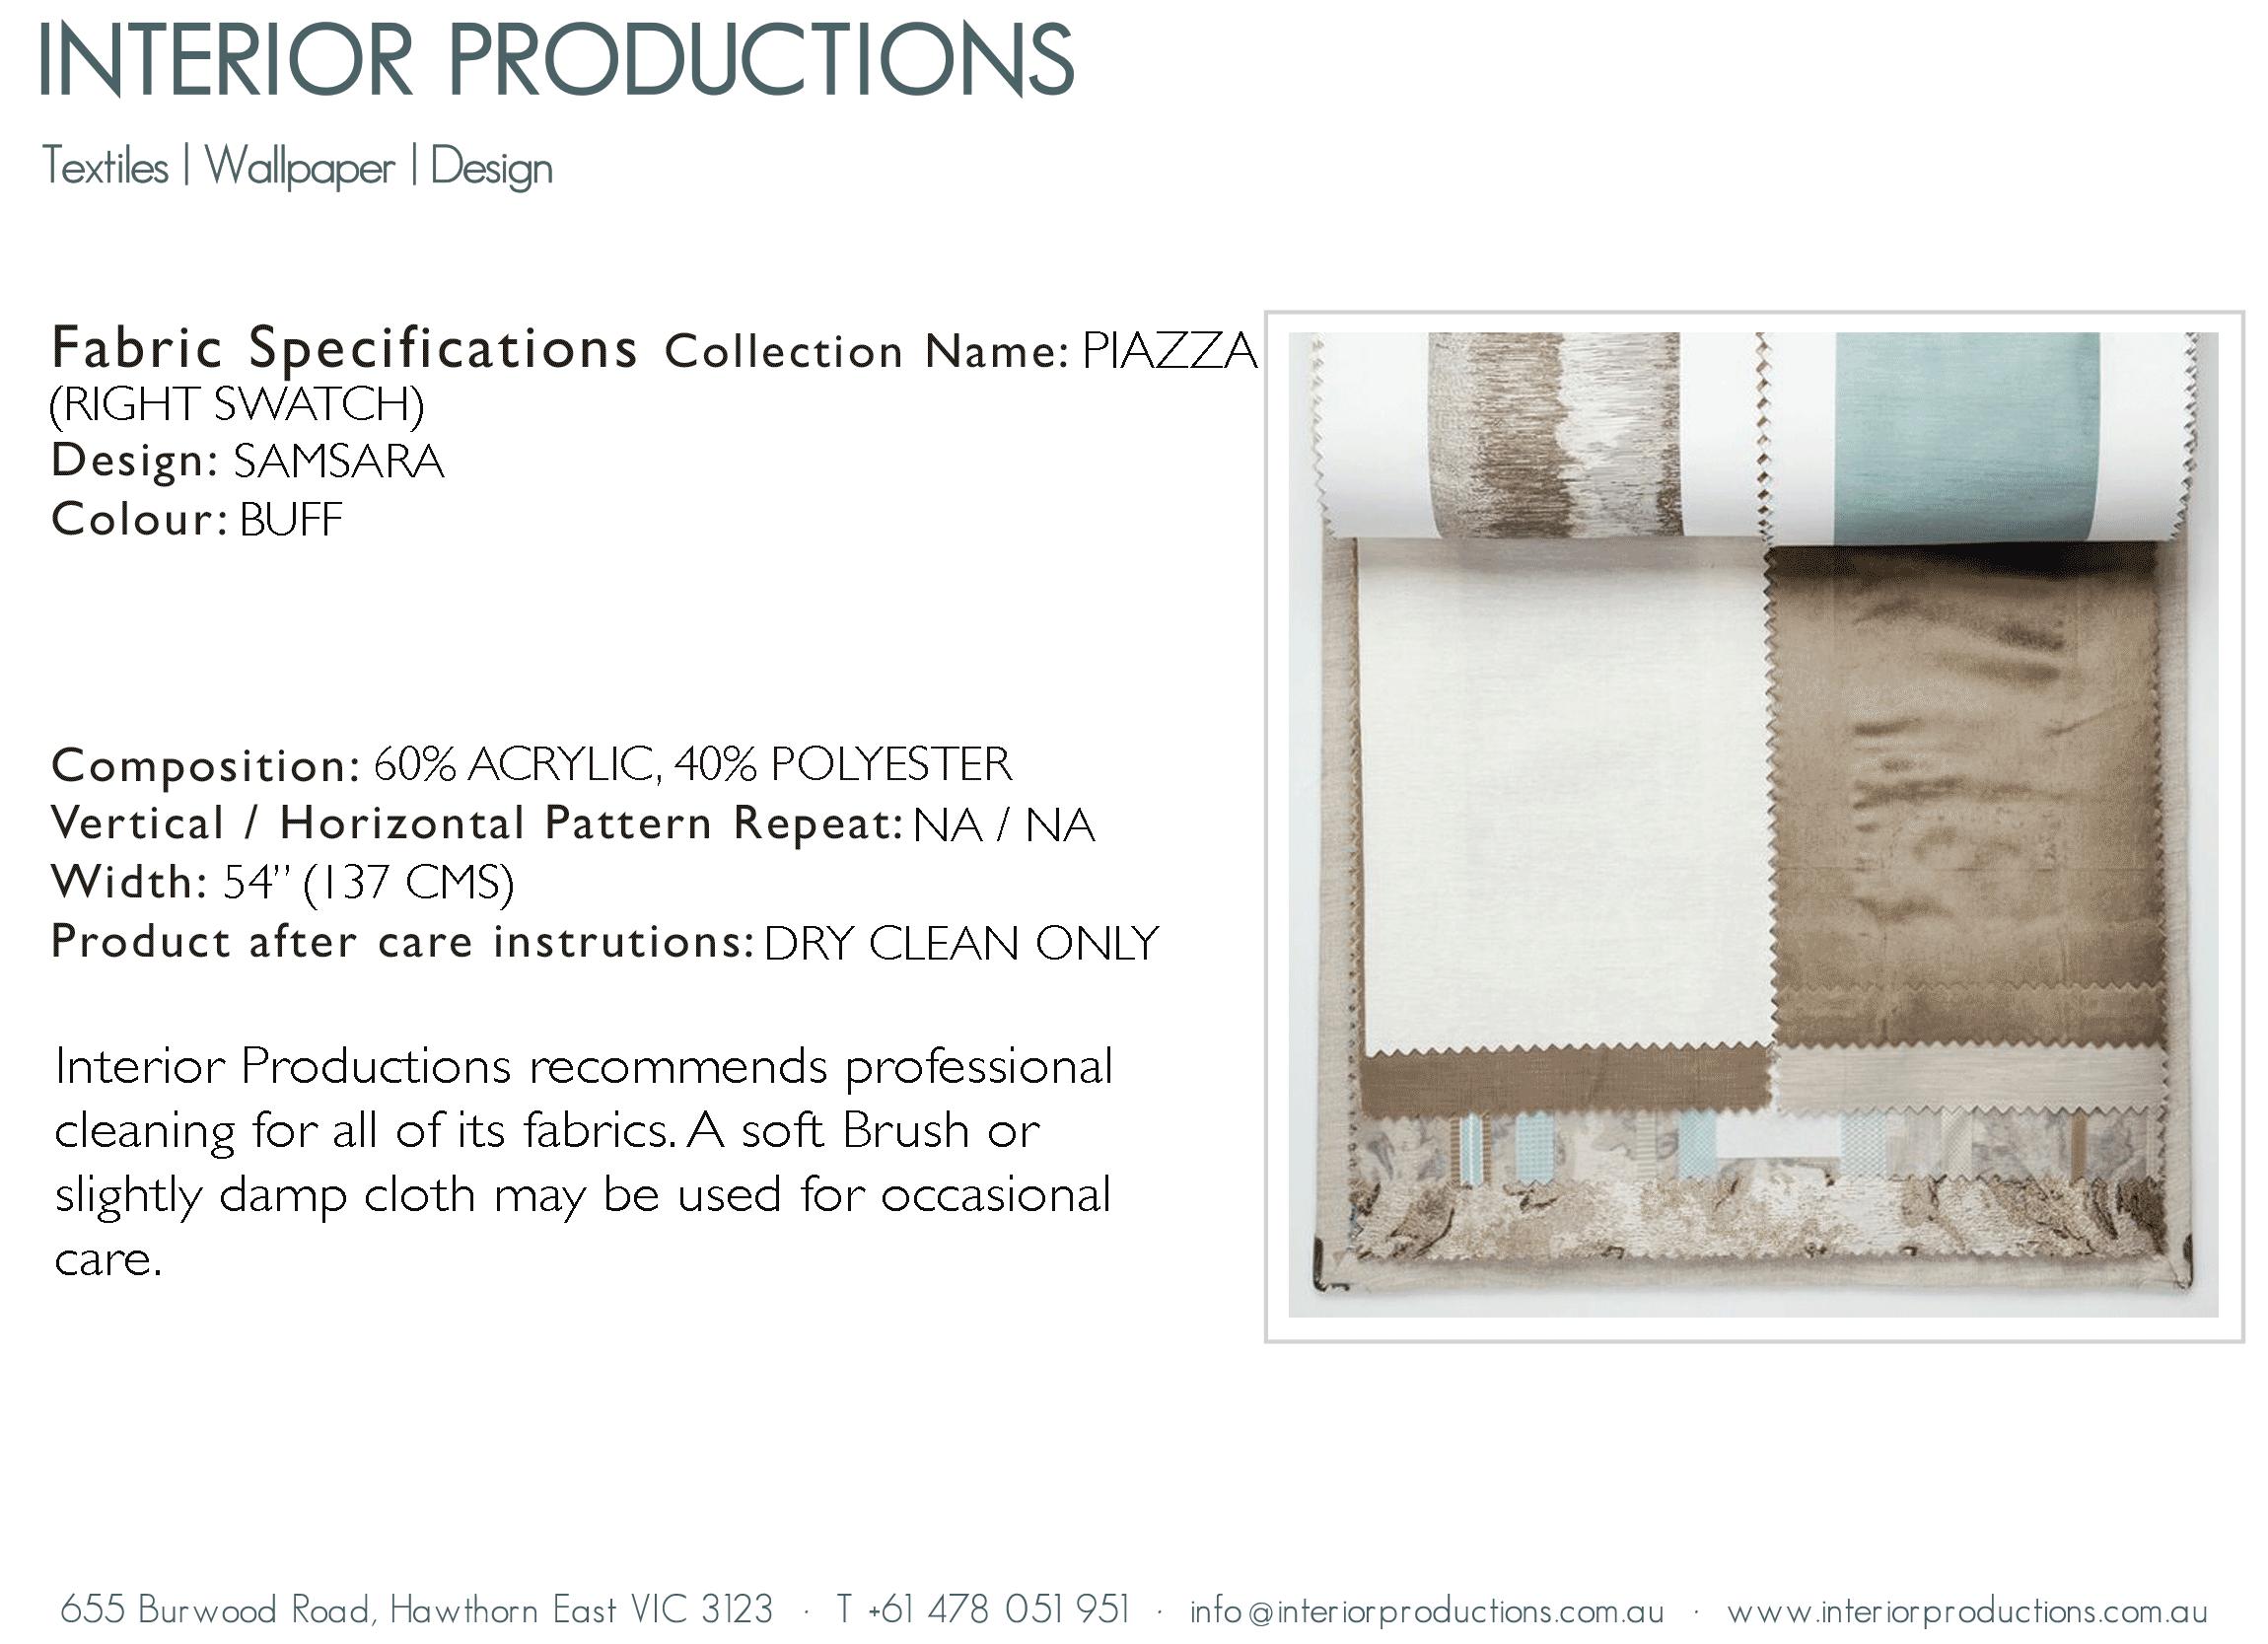 interior_productions_SAMSARA---BUFF